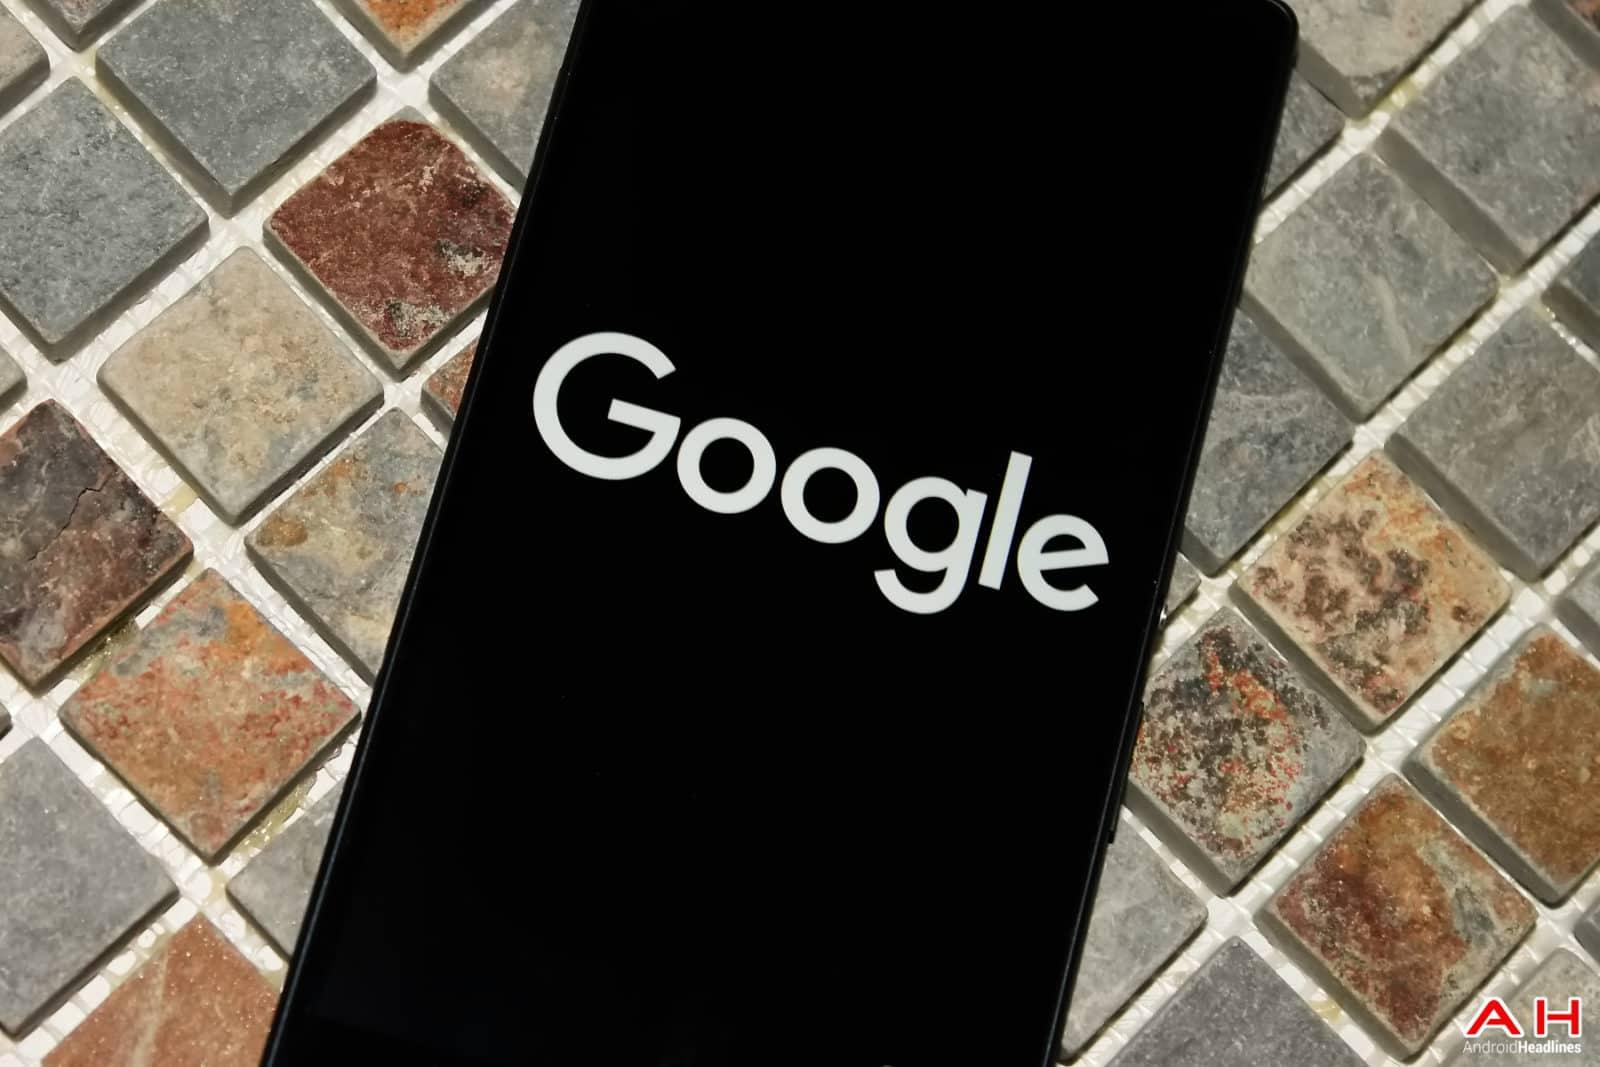 AH 2015 A New Google LOGO-170